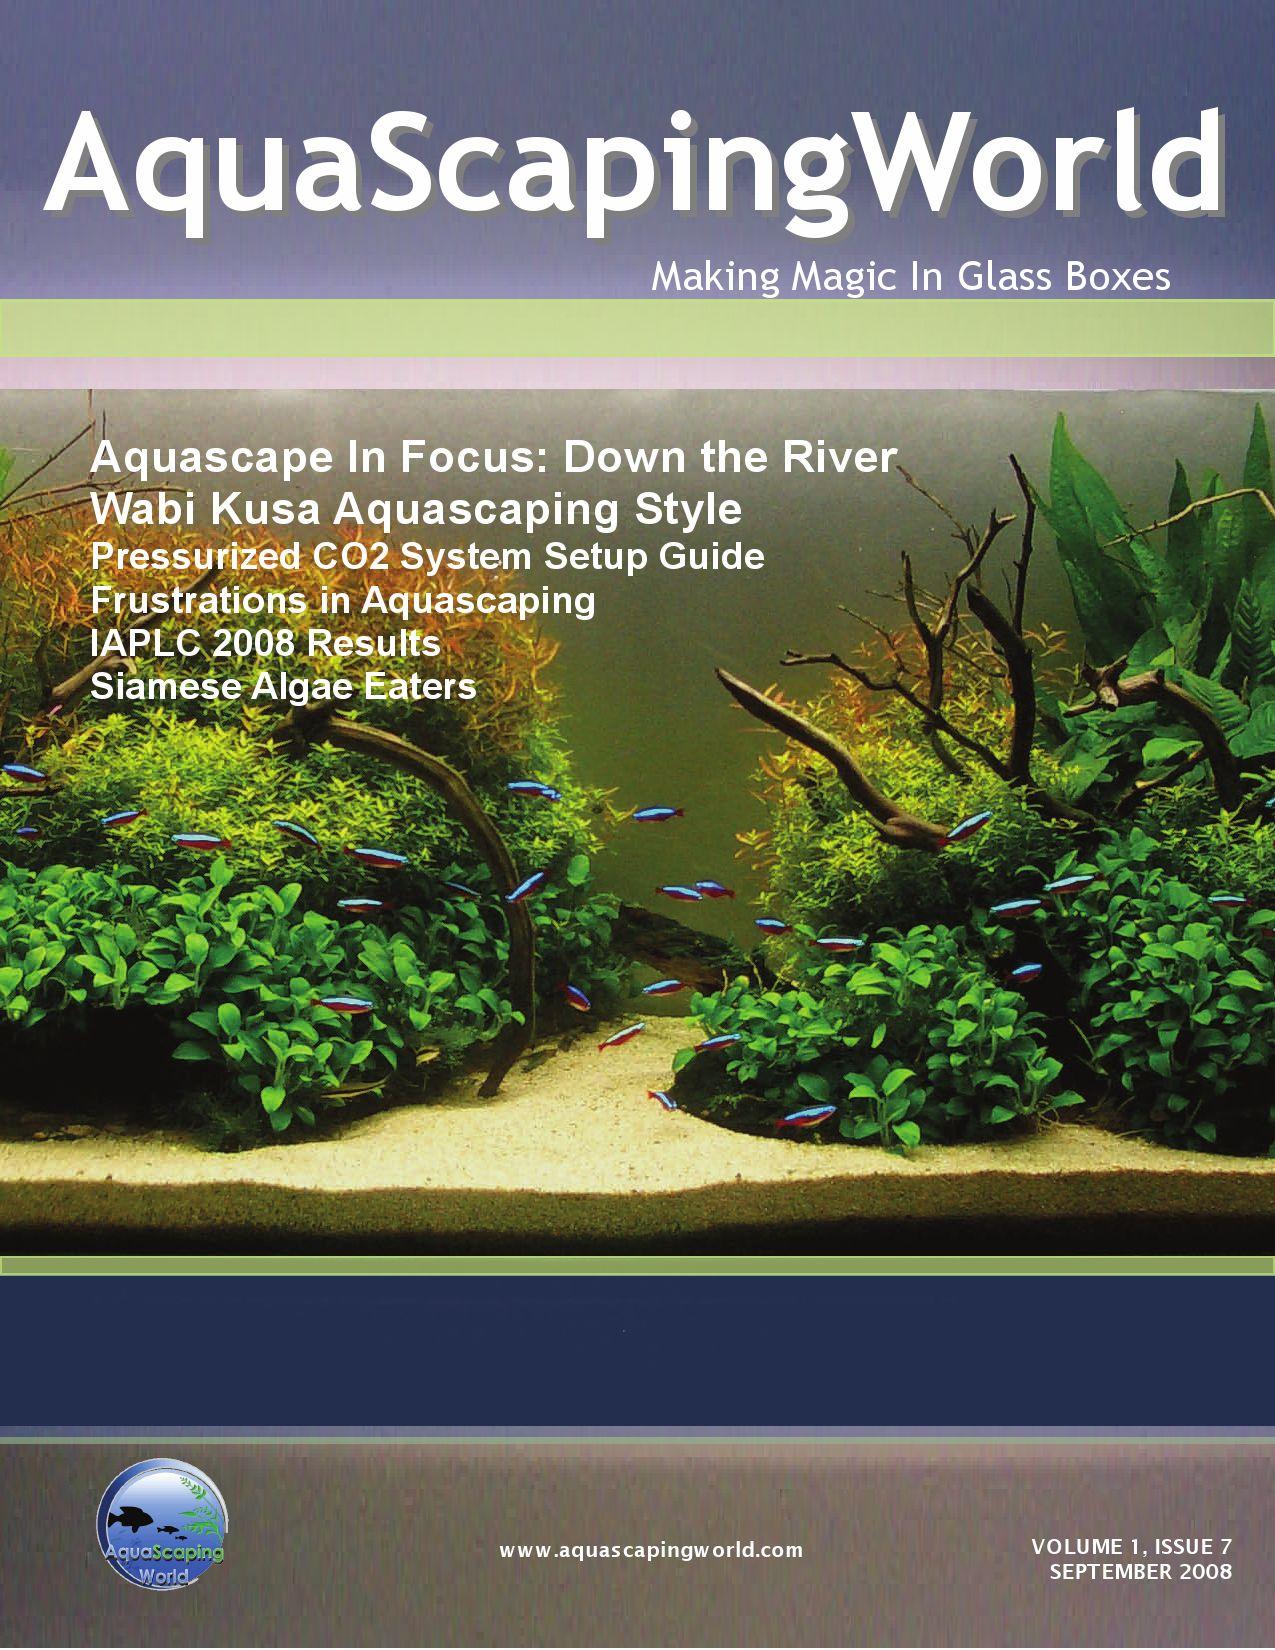 AquaScaping World Magazine September 2009 by John_N - Issuu